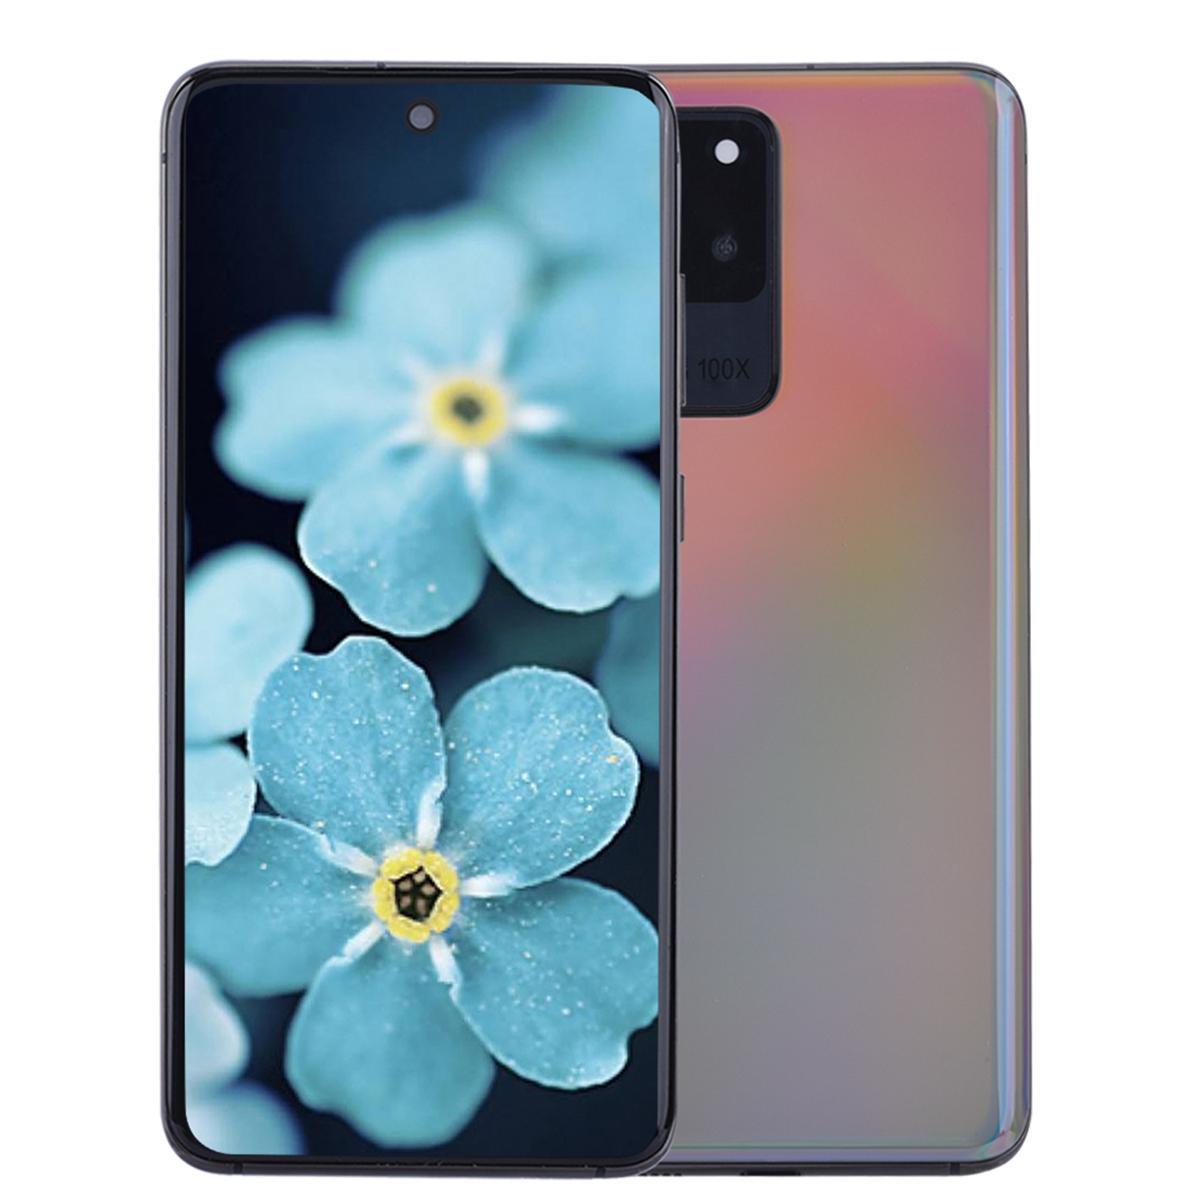 "6.9 6.7 6.4"" Punch-hole Full Screen SN20 Ultra 5G GPS20 Ultra ES20+ Android 10 Octa Core 256GB 512GB Fingerprint Face ID 4 Camera Smartphone"